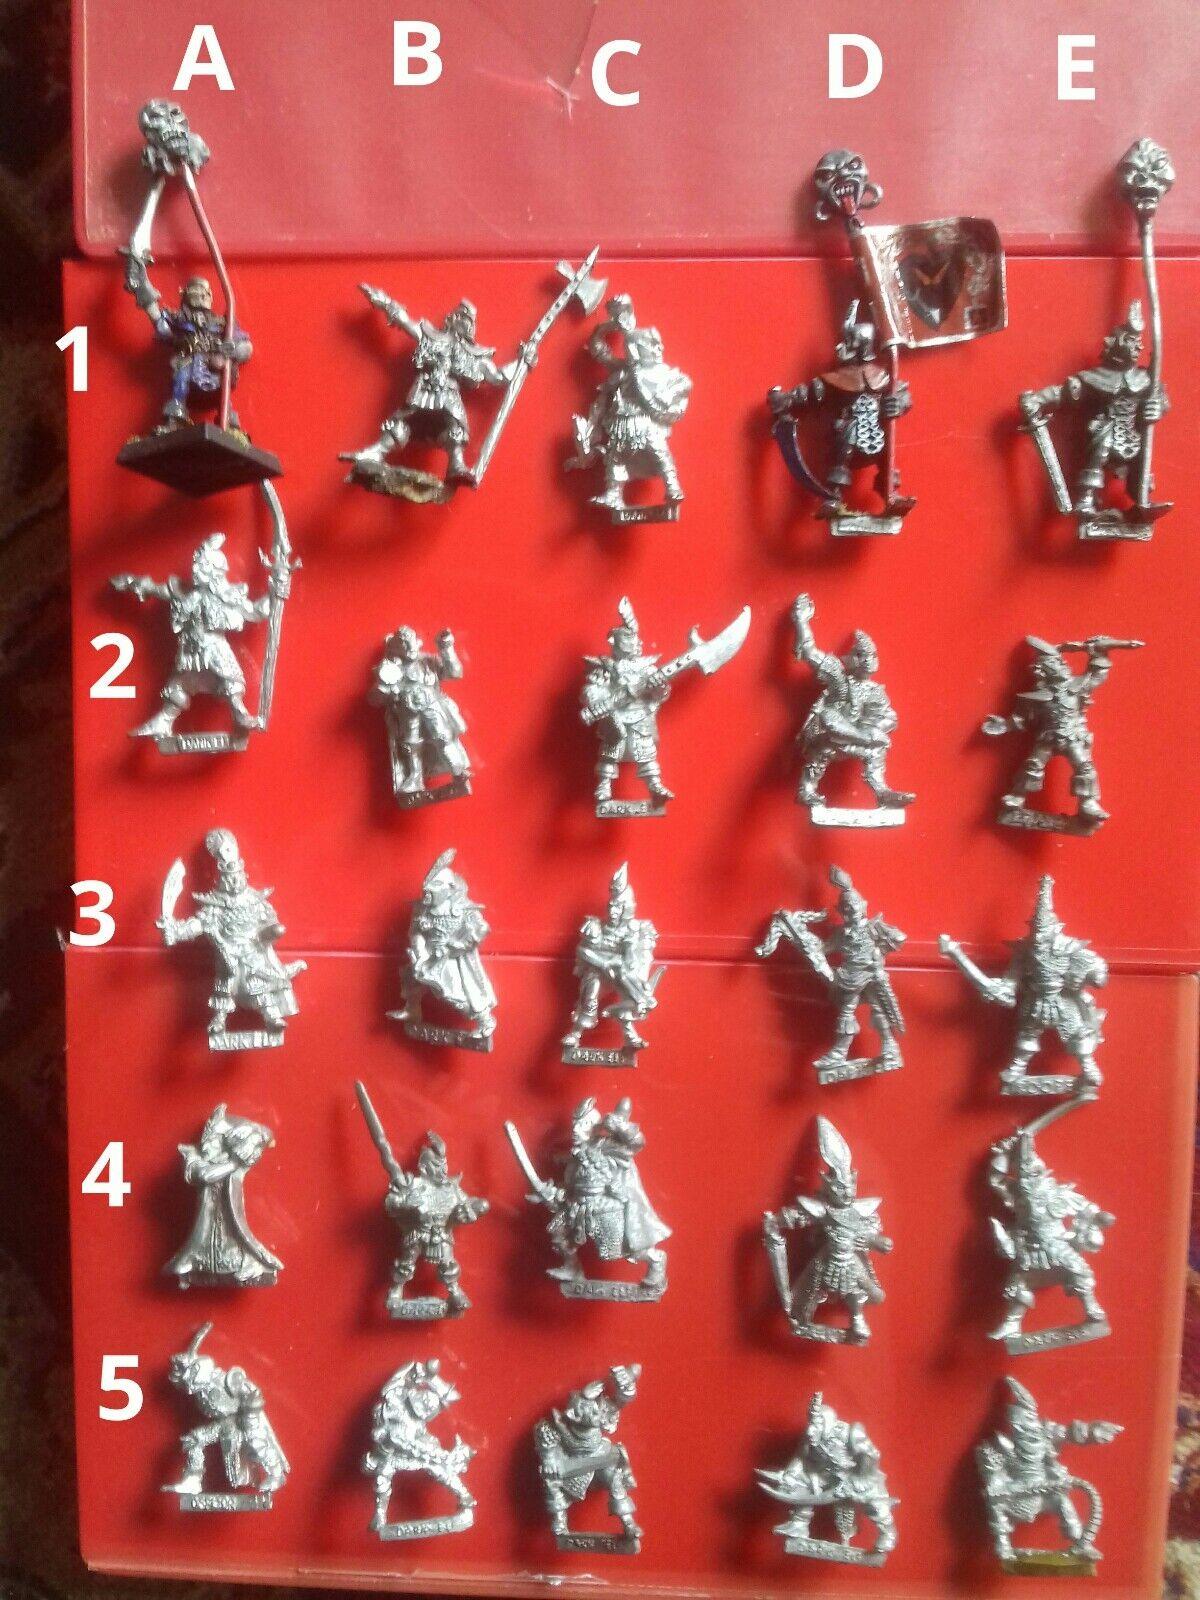 C09 Dark Elf Warriors Citadel GW Games Workshop Elfes socle  3rd Compendium  en bonne santé